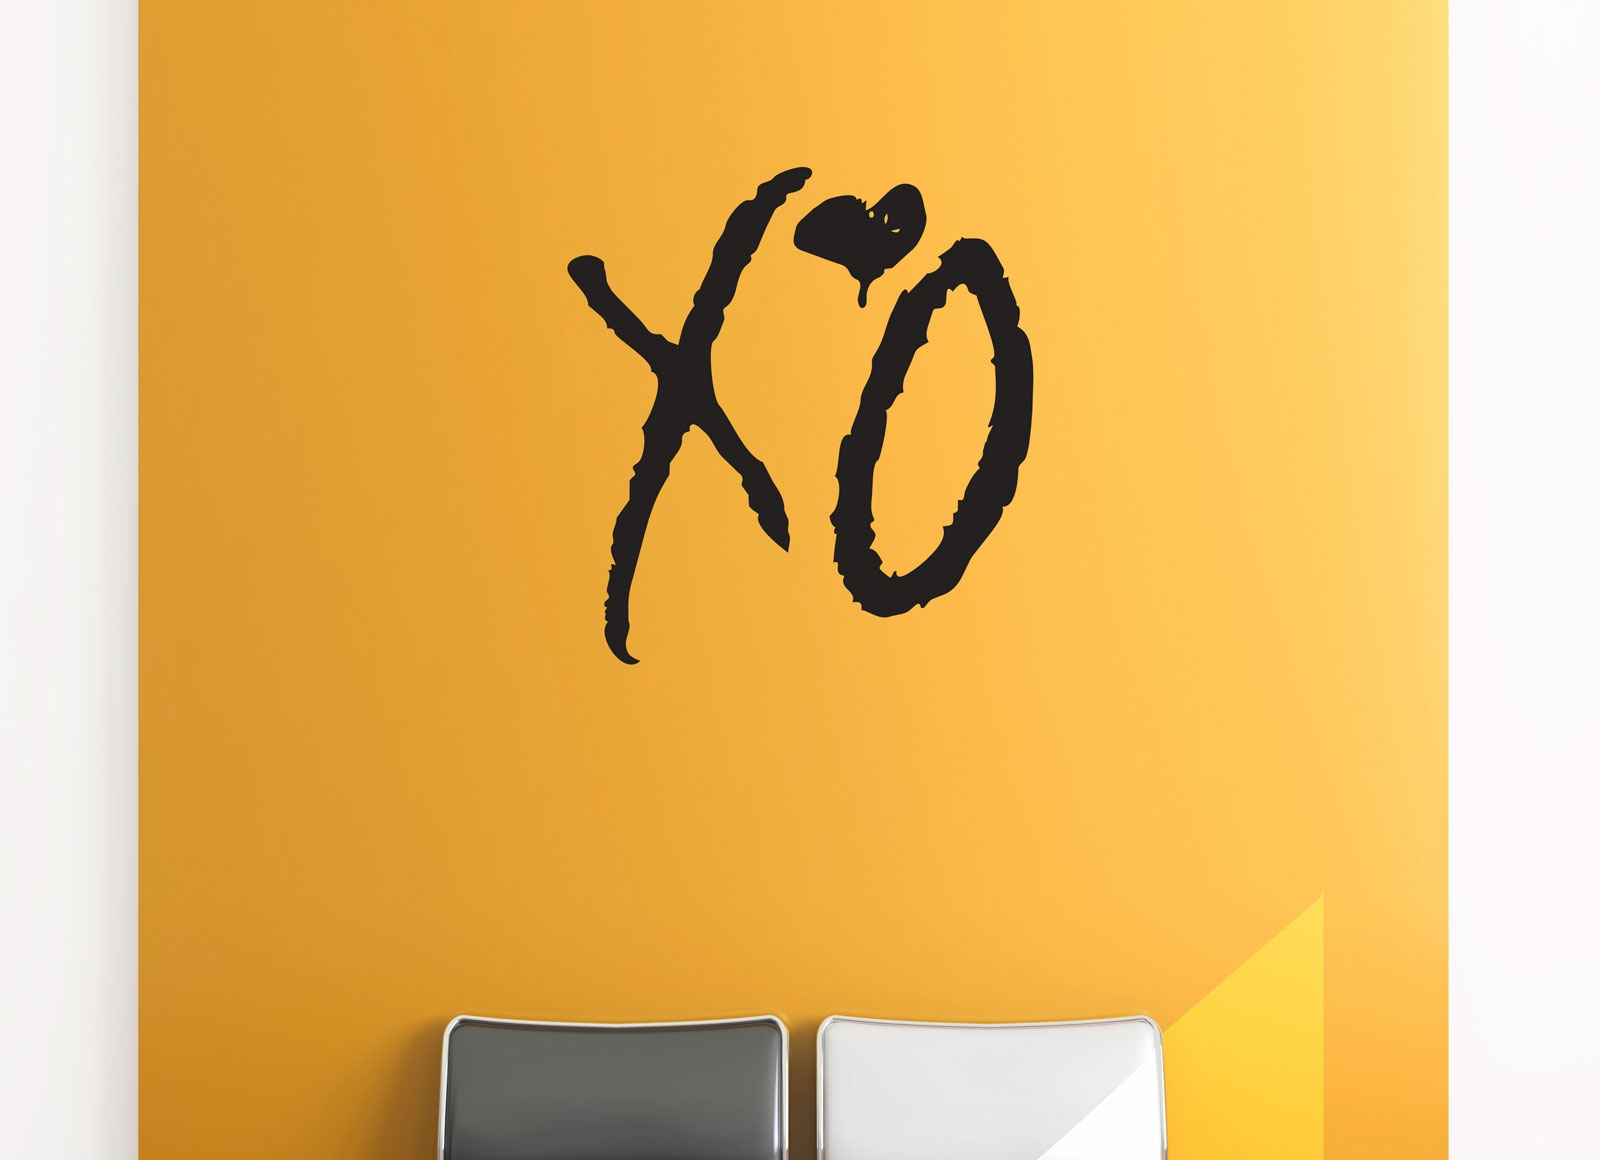 Xo love kiss hug removable wall art the weeknd hip hop decal vinyl sticker ozdeco t s polonaiz